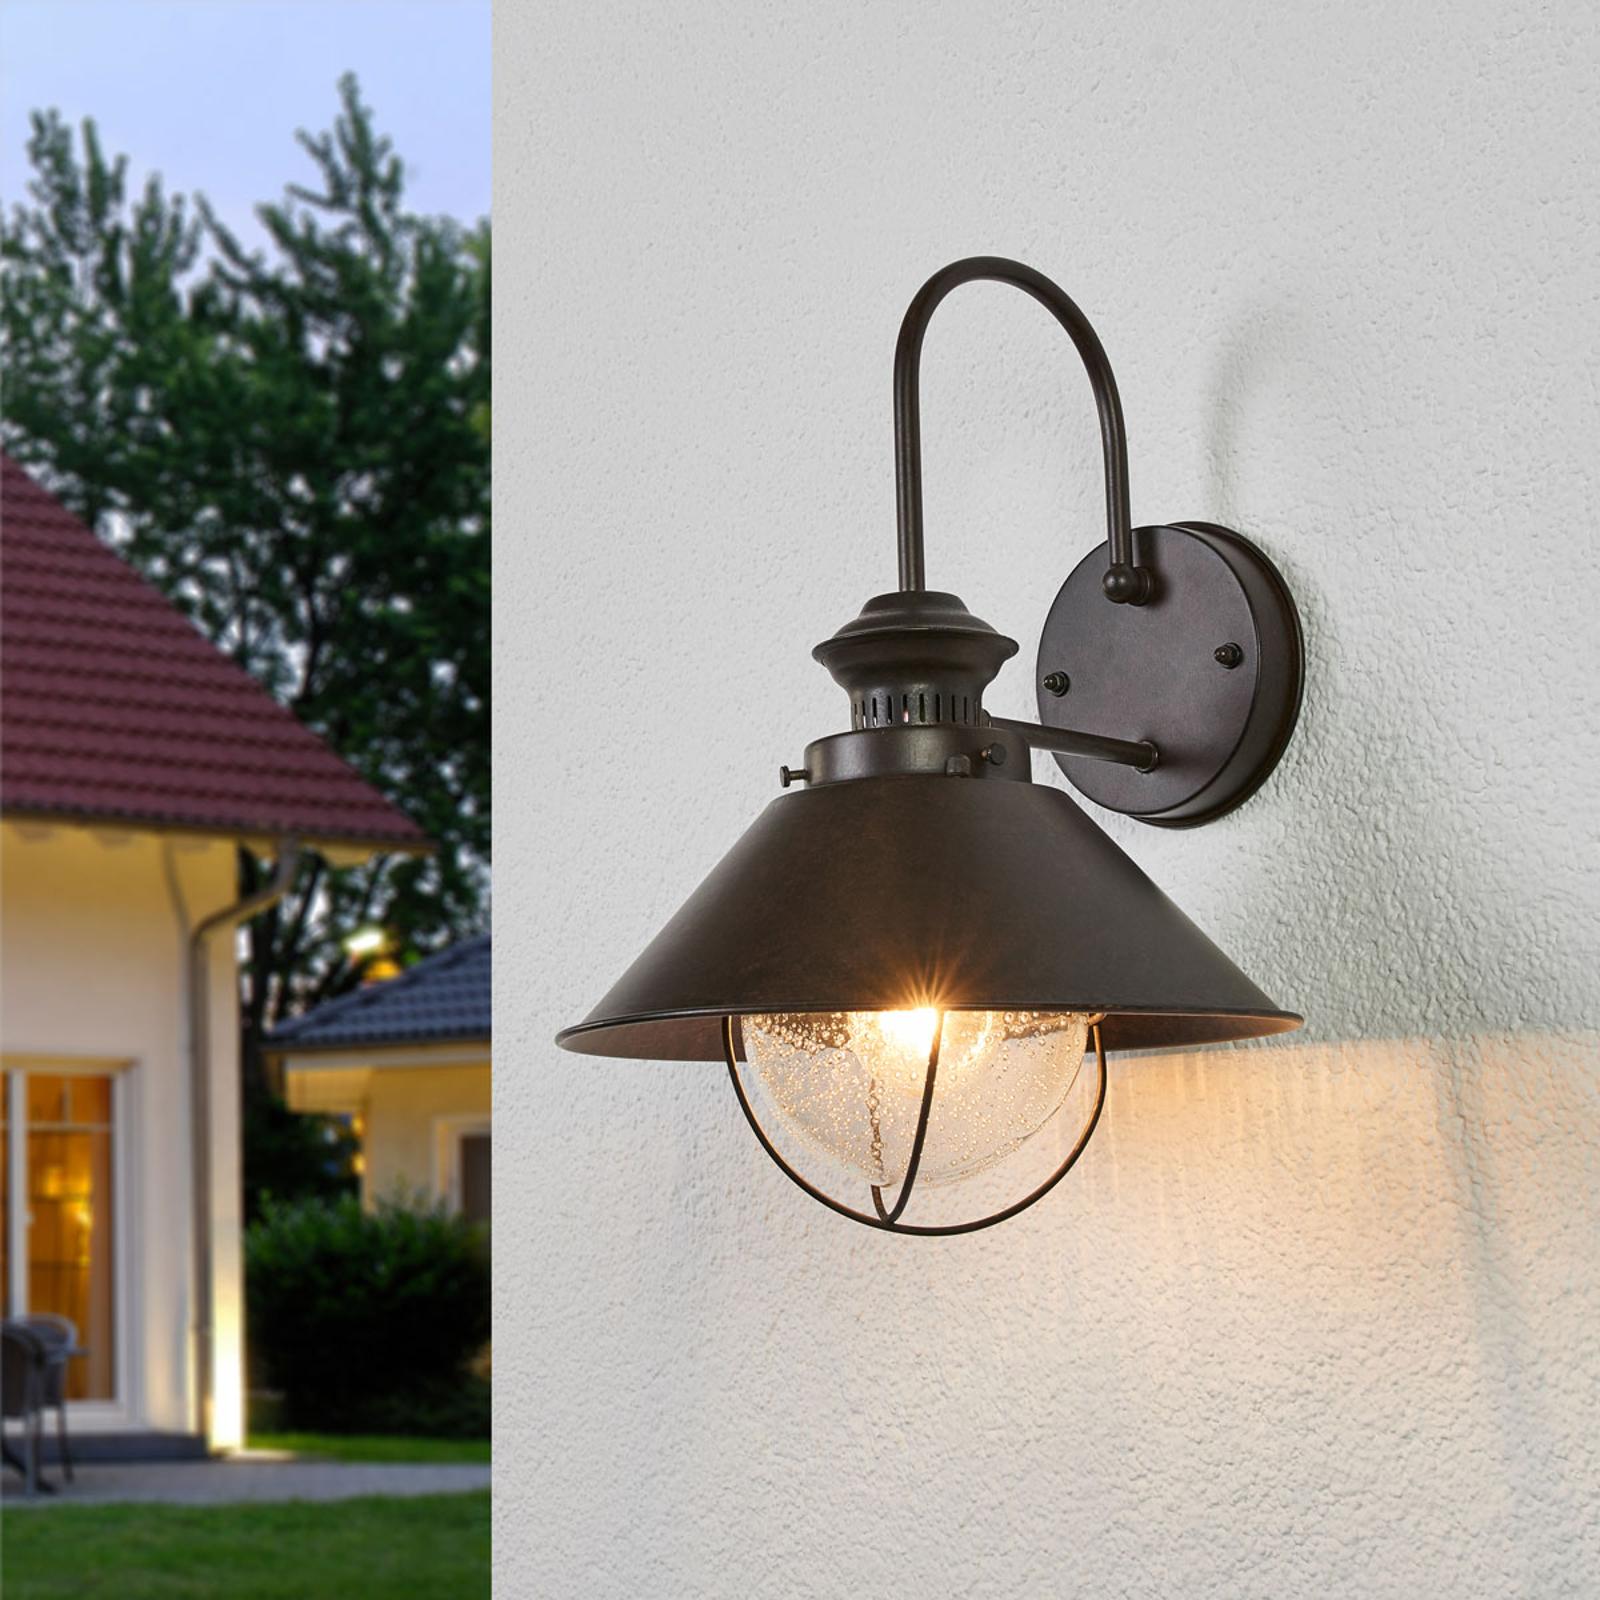 Charming Nautica Exterior Wall Lamp_3505157_1